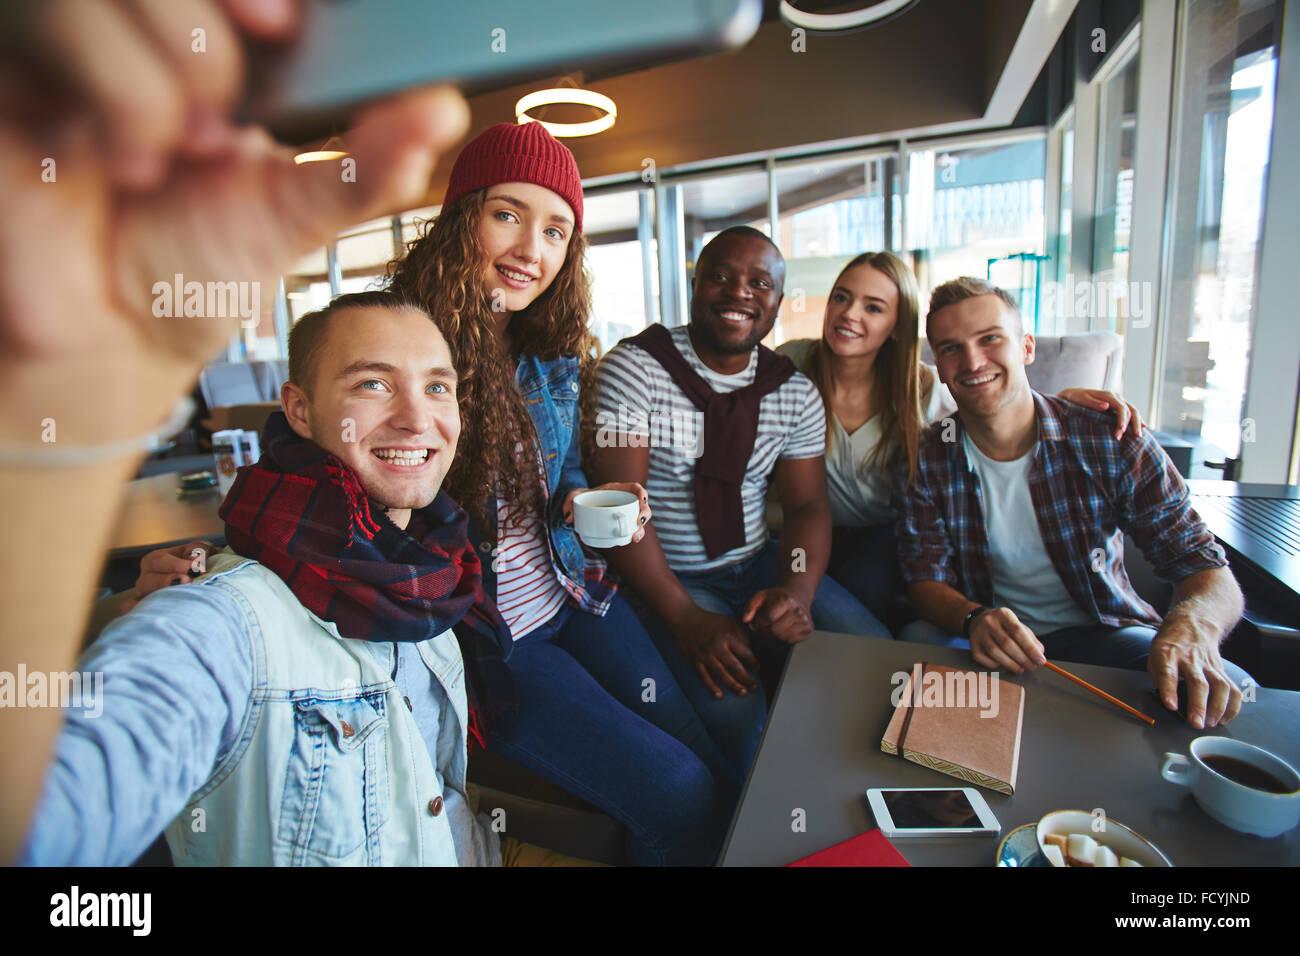 Amis adolescents décisions lors du recueil des selfies in cafe Photo Stock